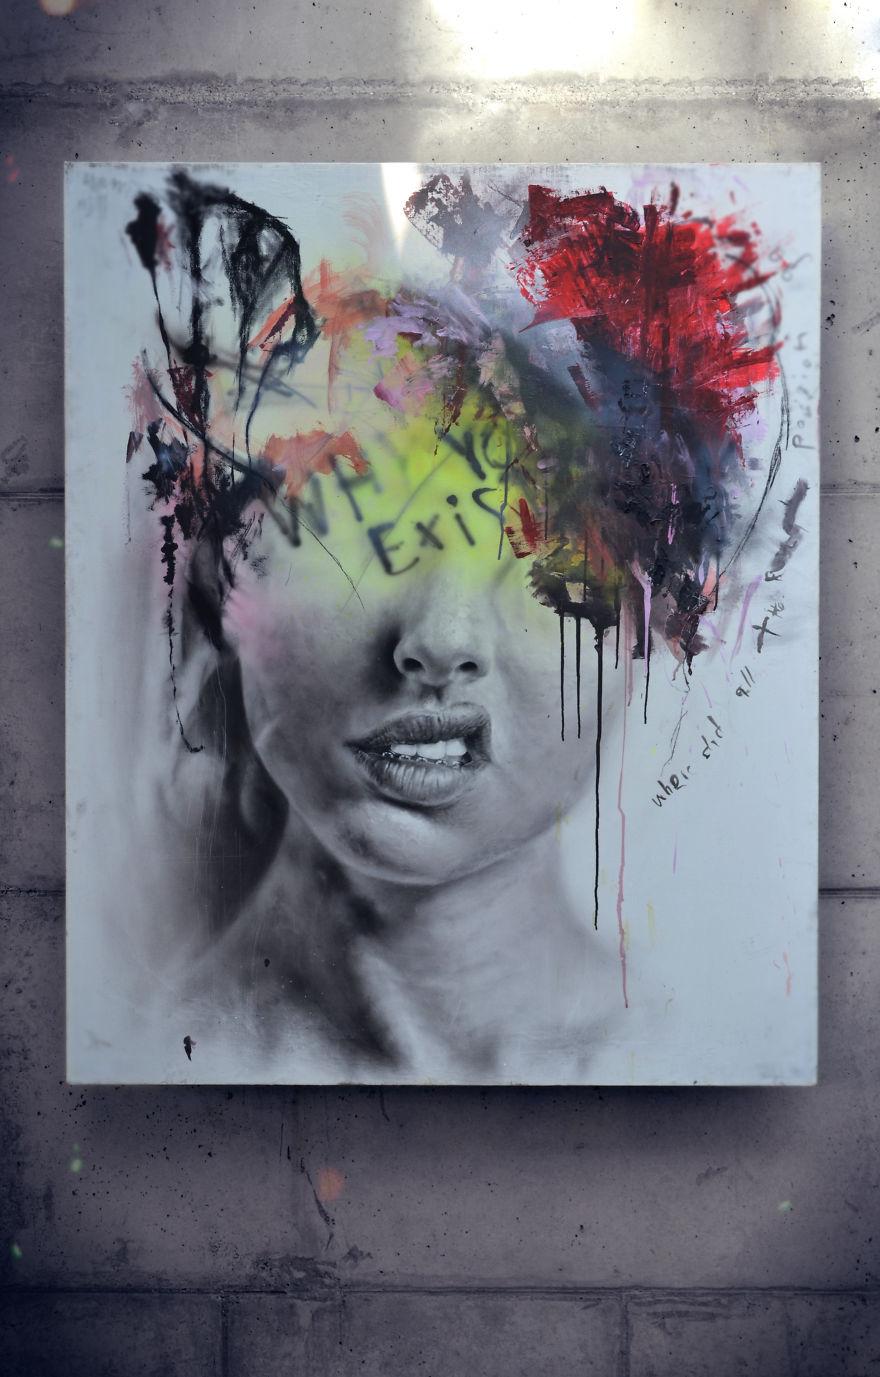 IGOR DOBROWOLSKI - Exploring Tragedies in People's Lives - the vandallist (1)